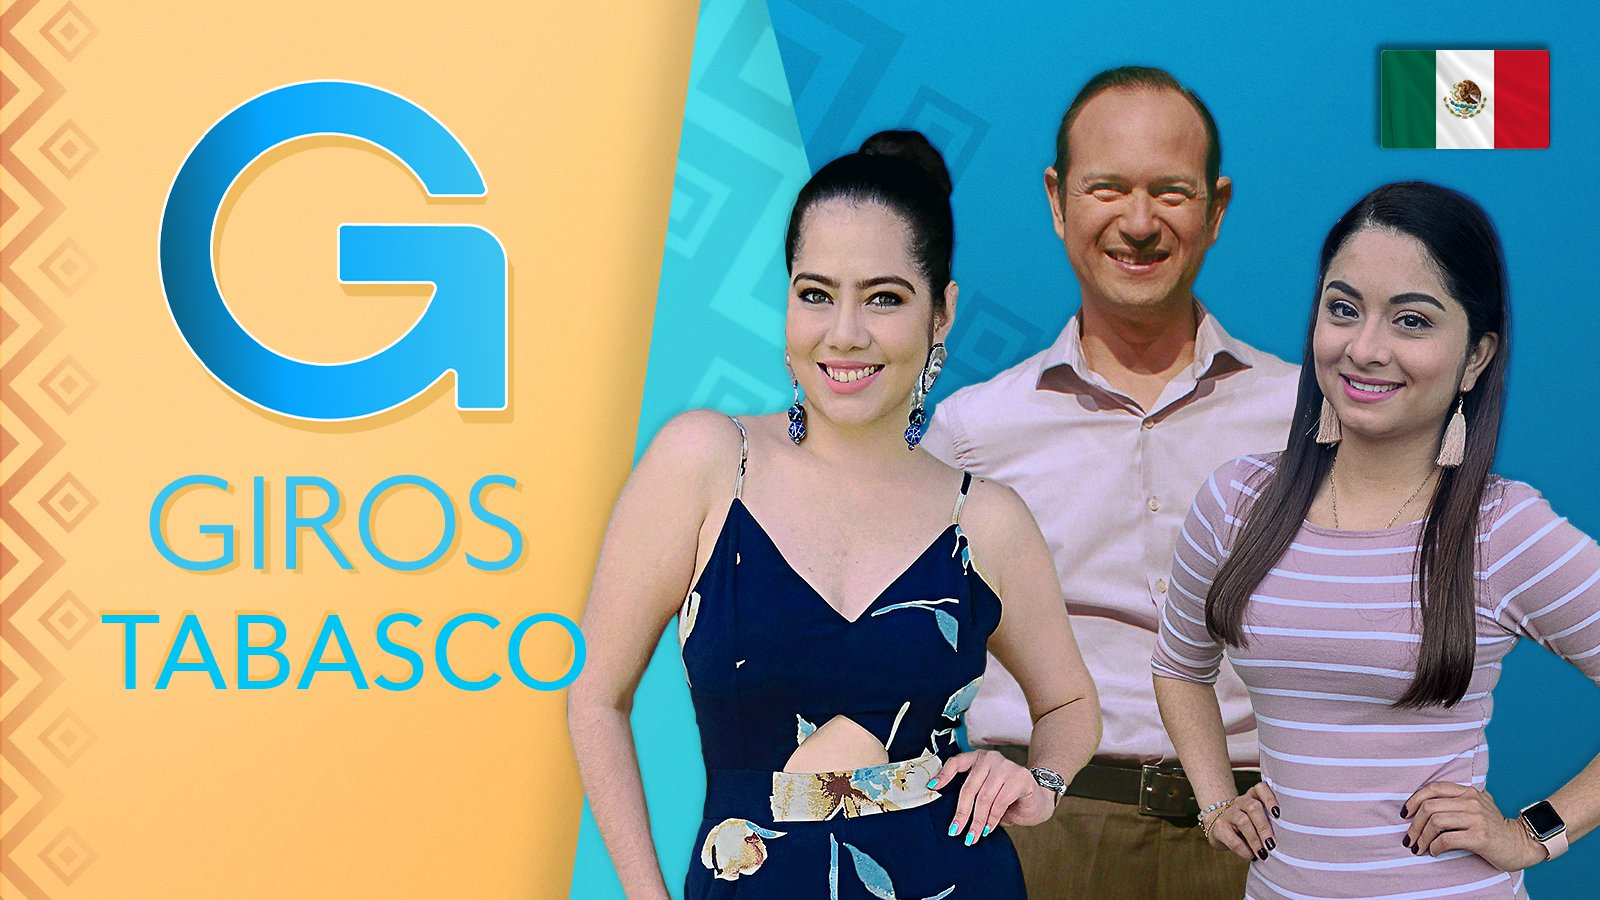 Giros Tabasco poster